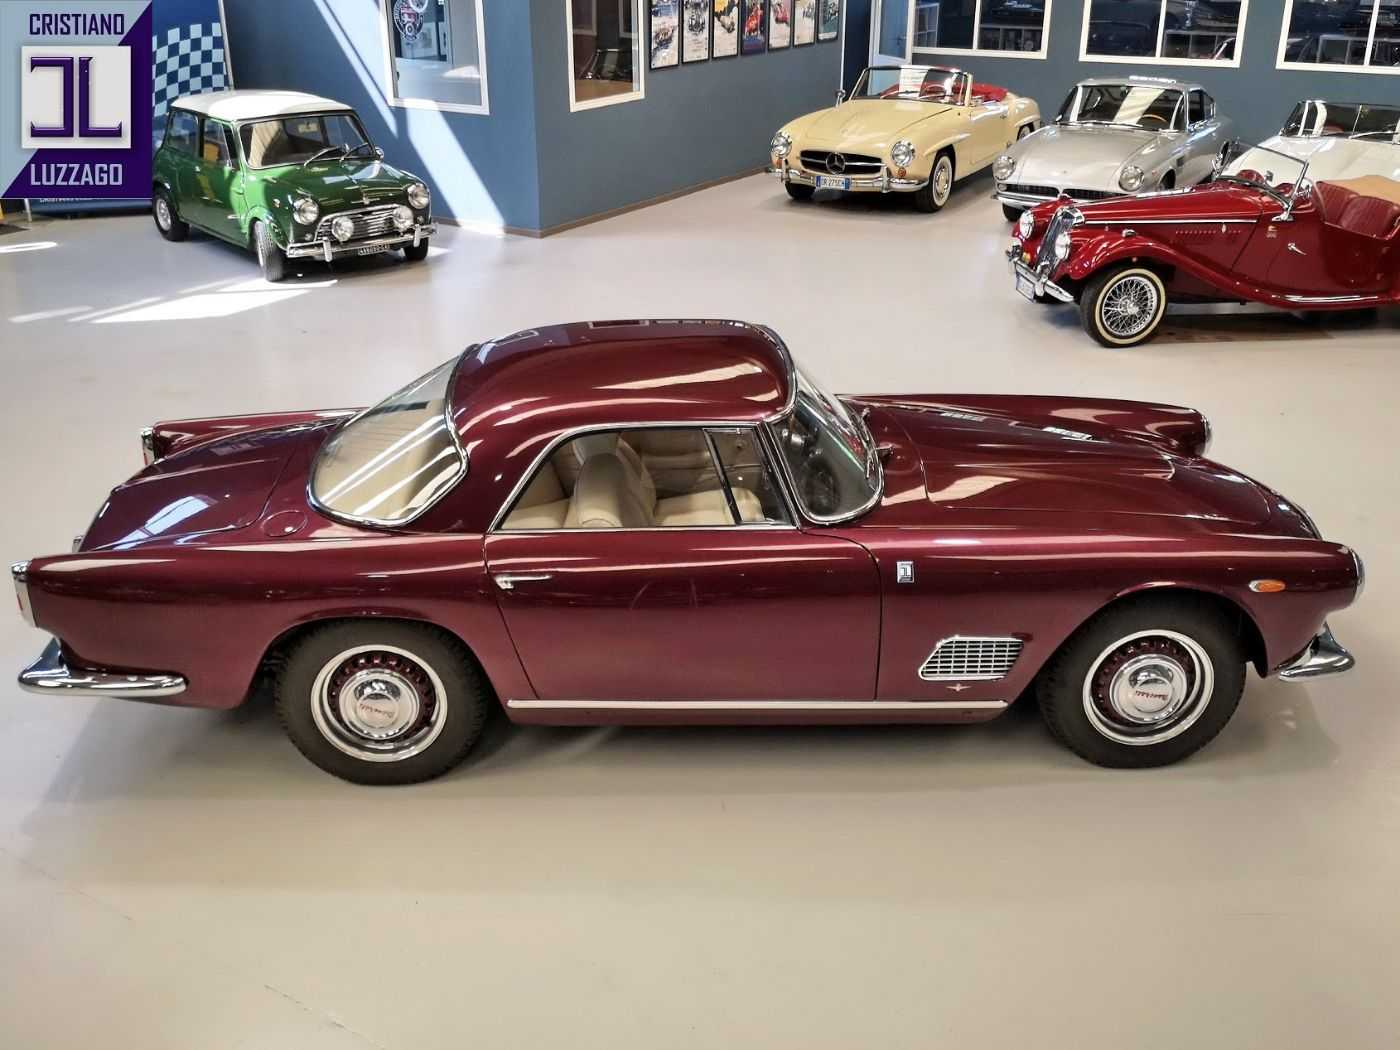 Maserati 3500 3500 GT TOURING SUPERLEGGERA de 1959 à vendre - Automobiles de collection Classic ...